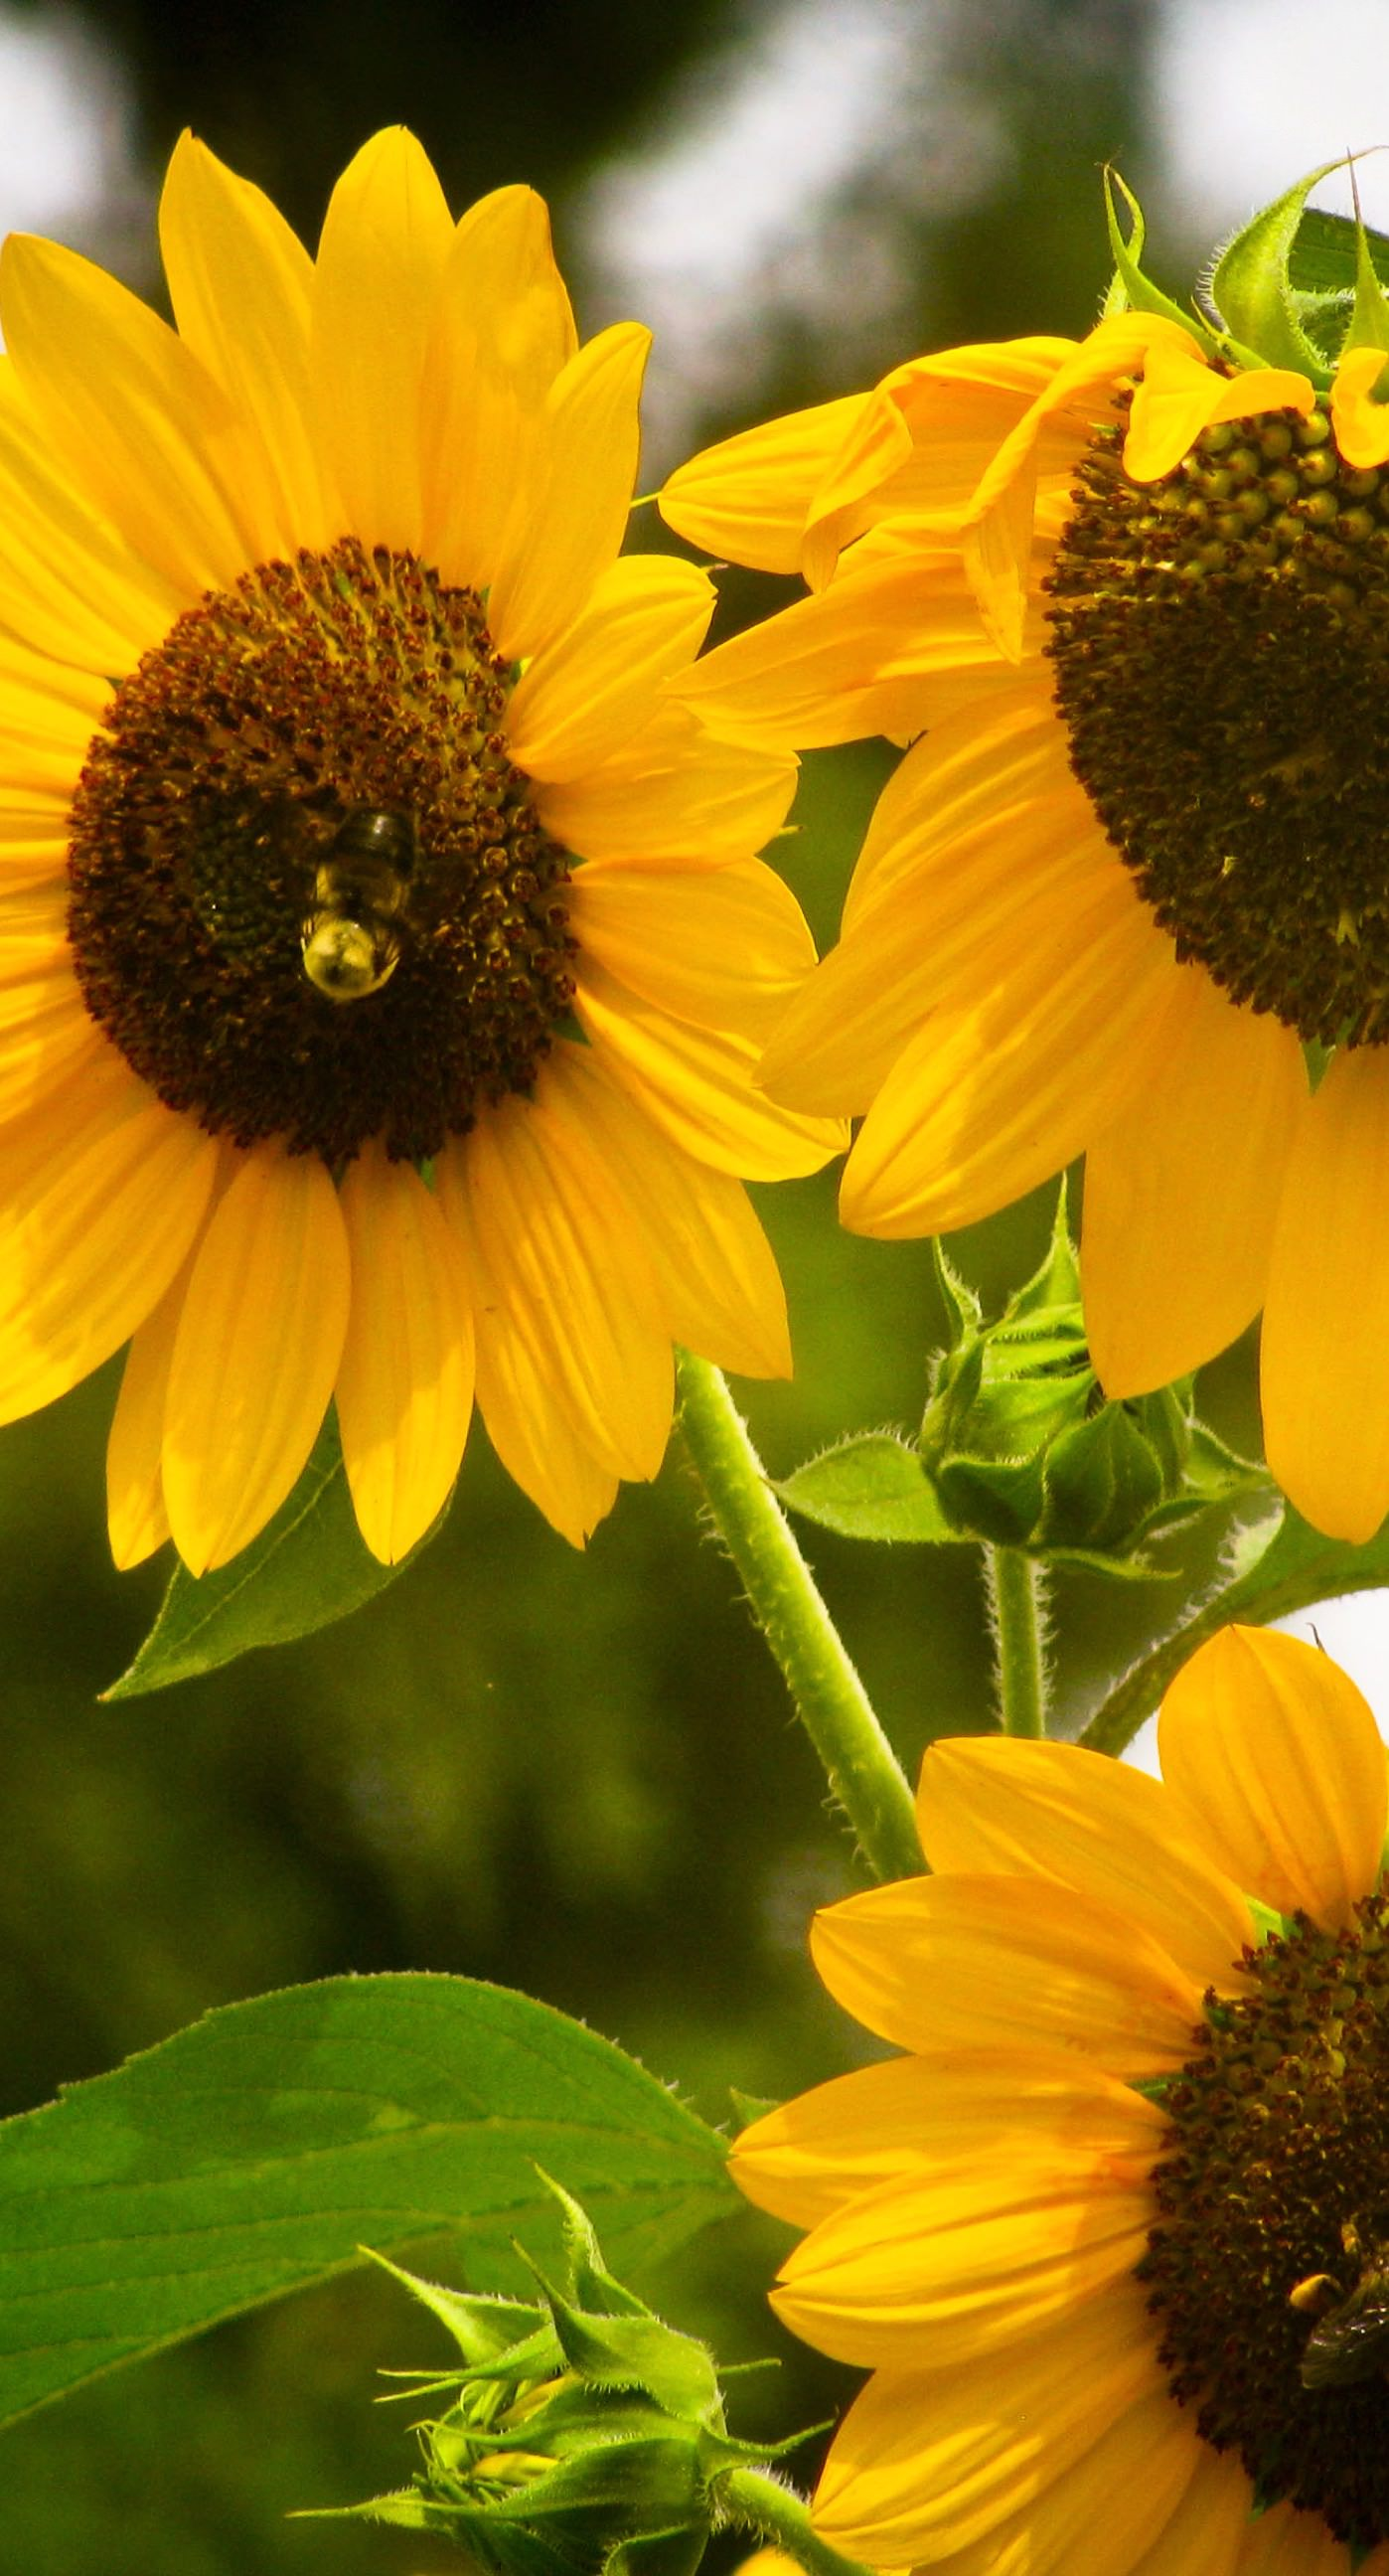 Wallpaper iphone kuning - Sunflower Yellow Iphone7 Plus Wallpaper